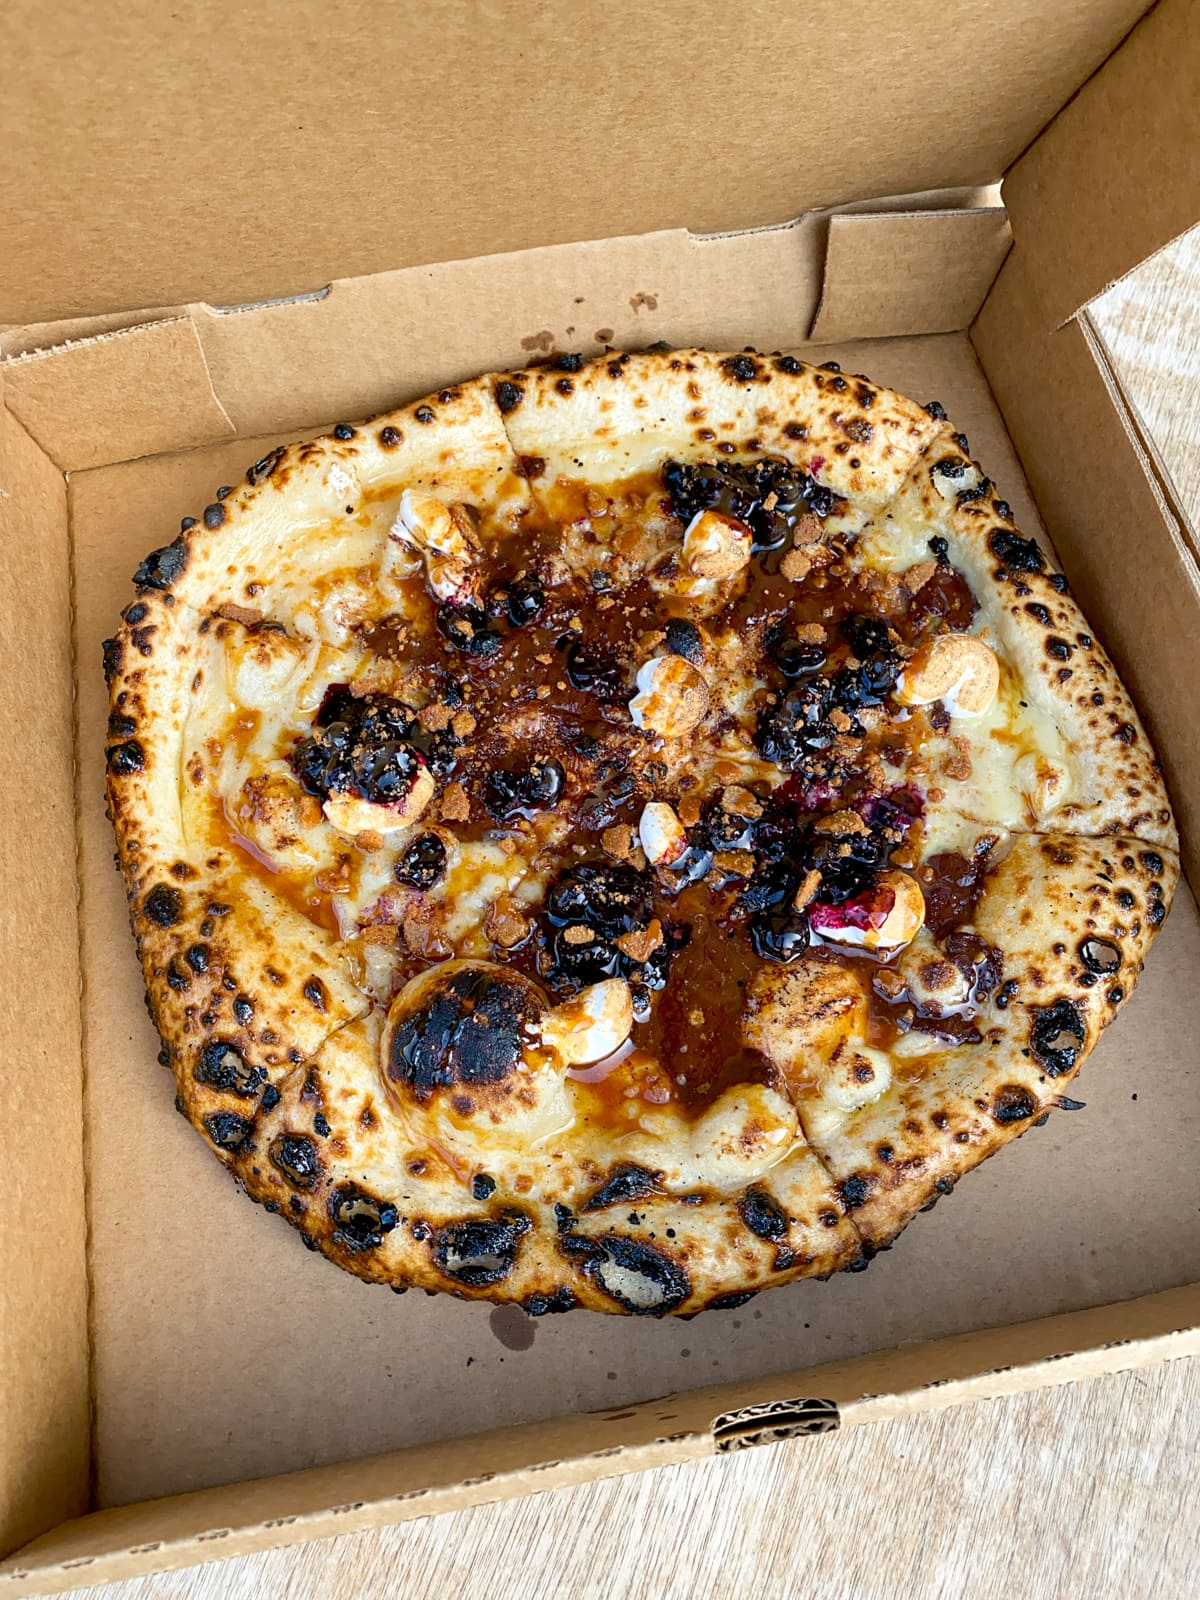 Bufalina dessert pizza